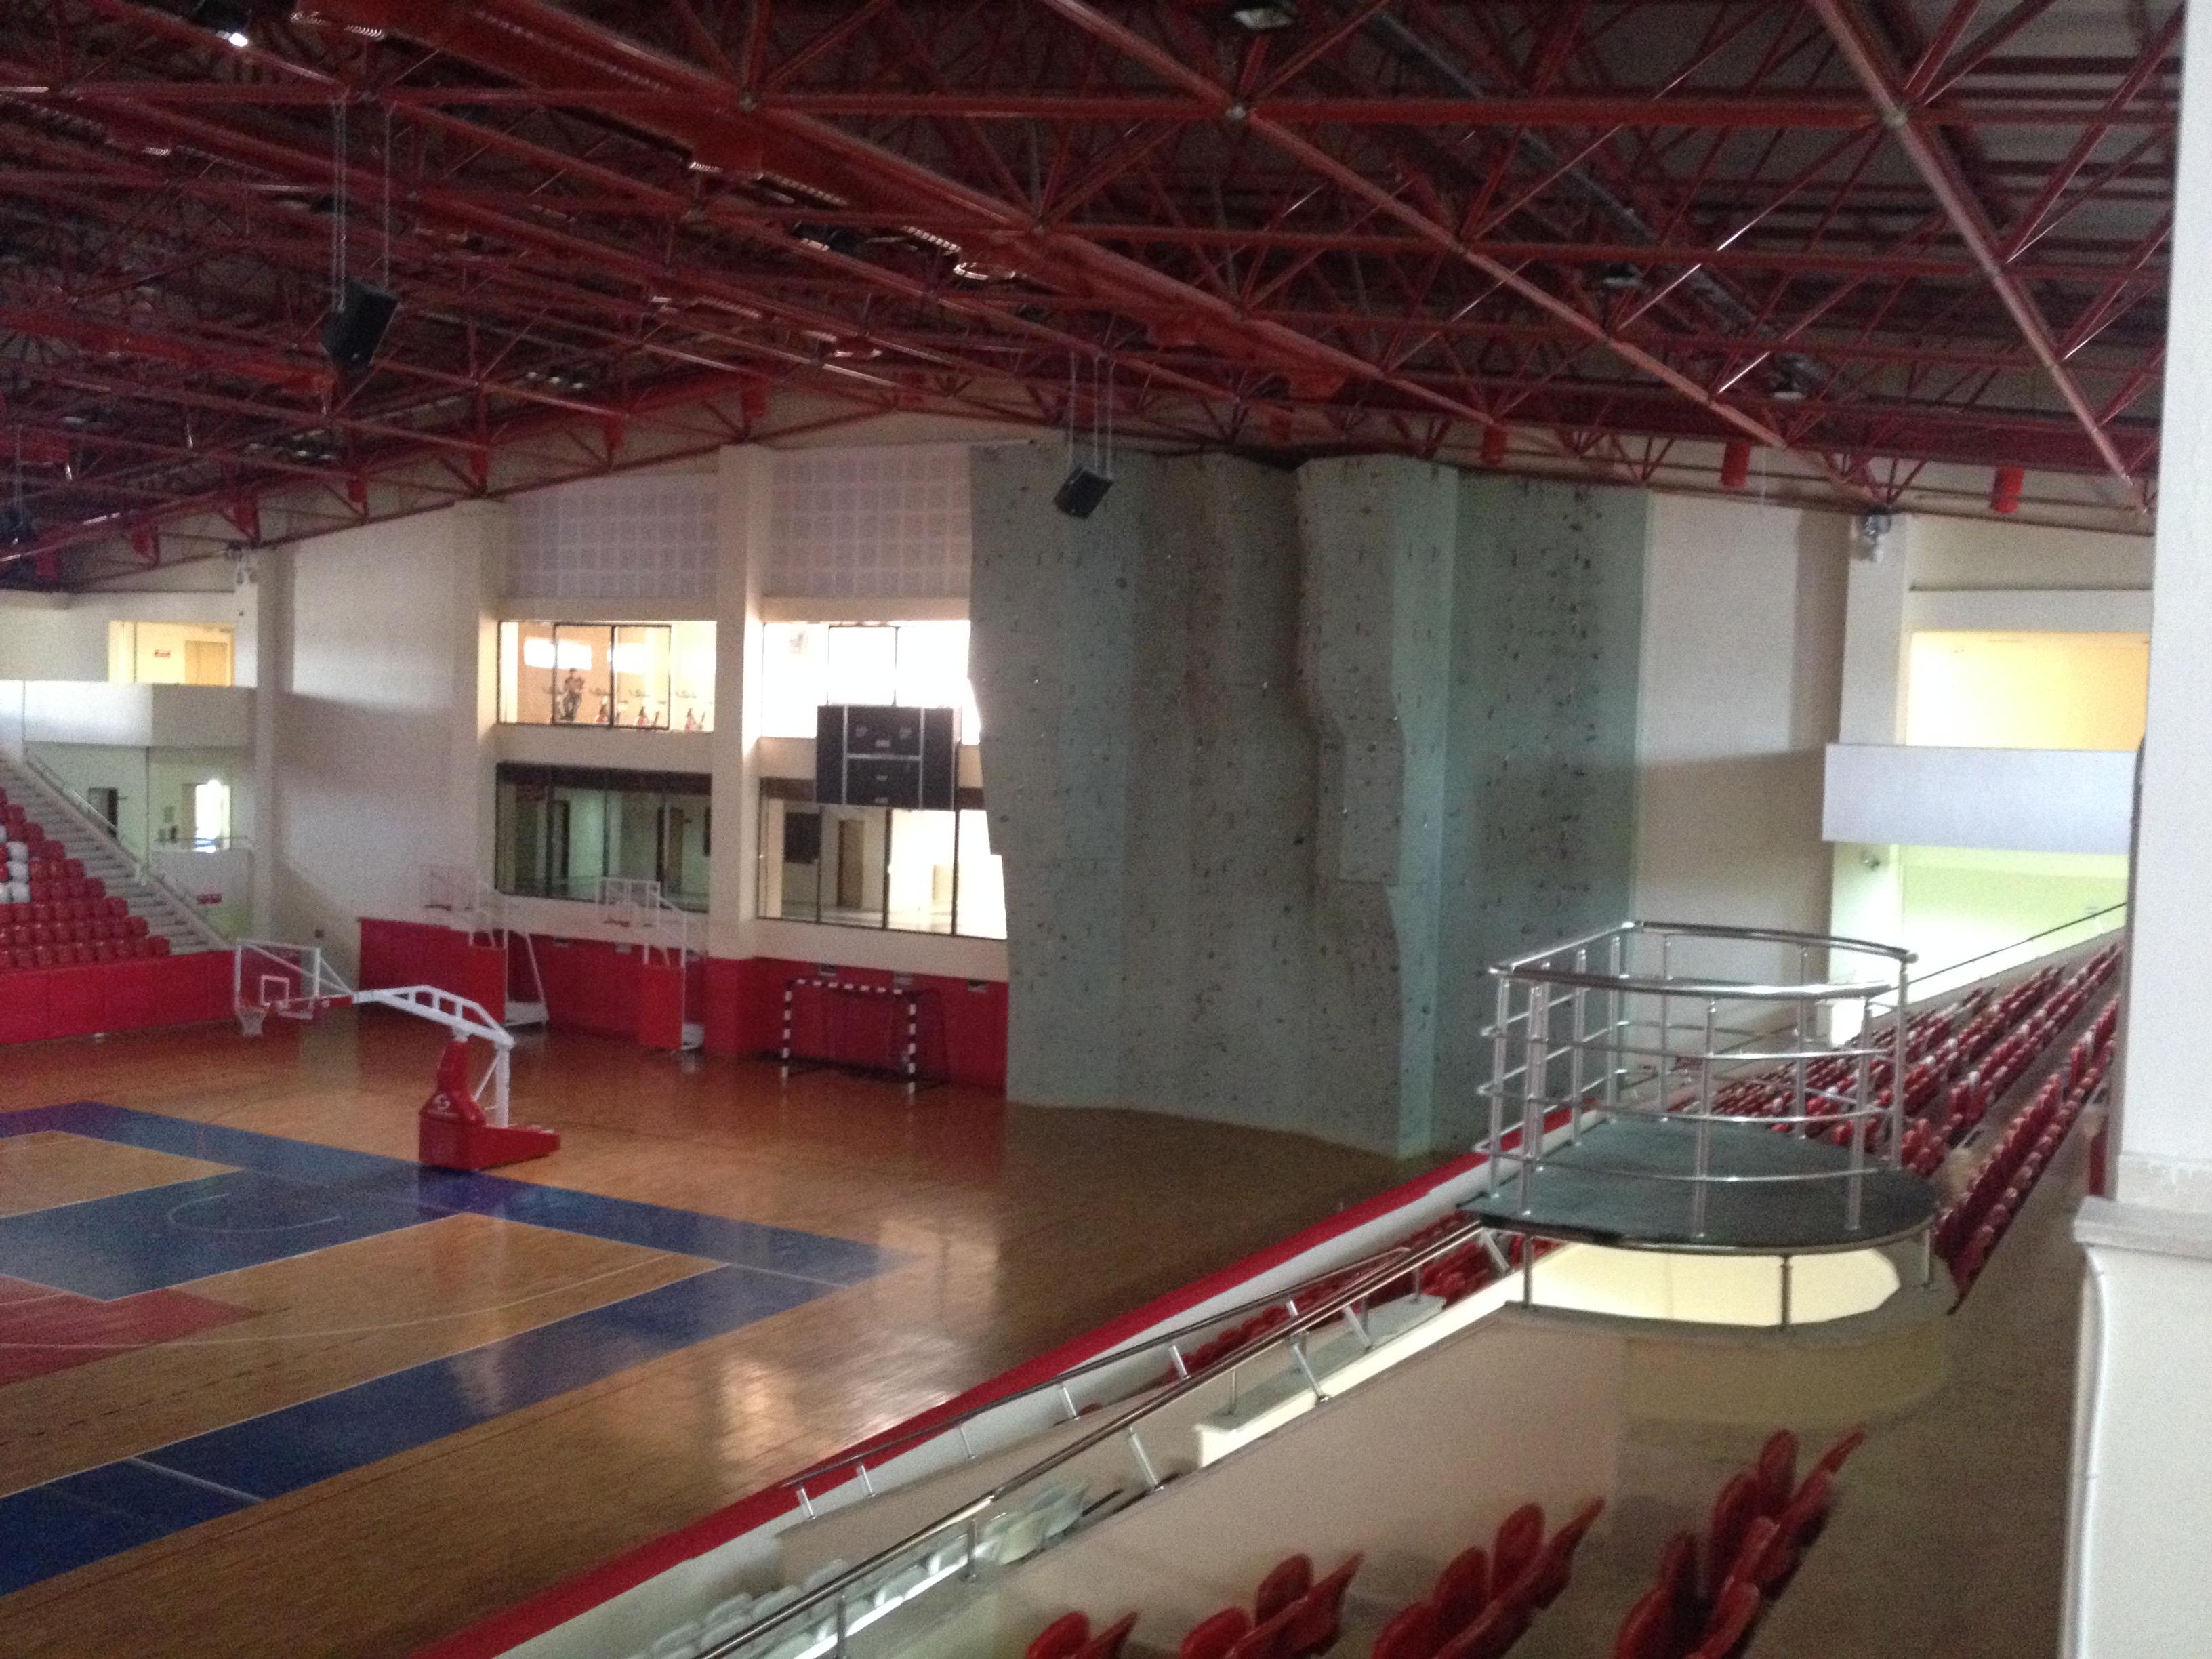 sdü spor salonu (1)